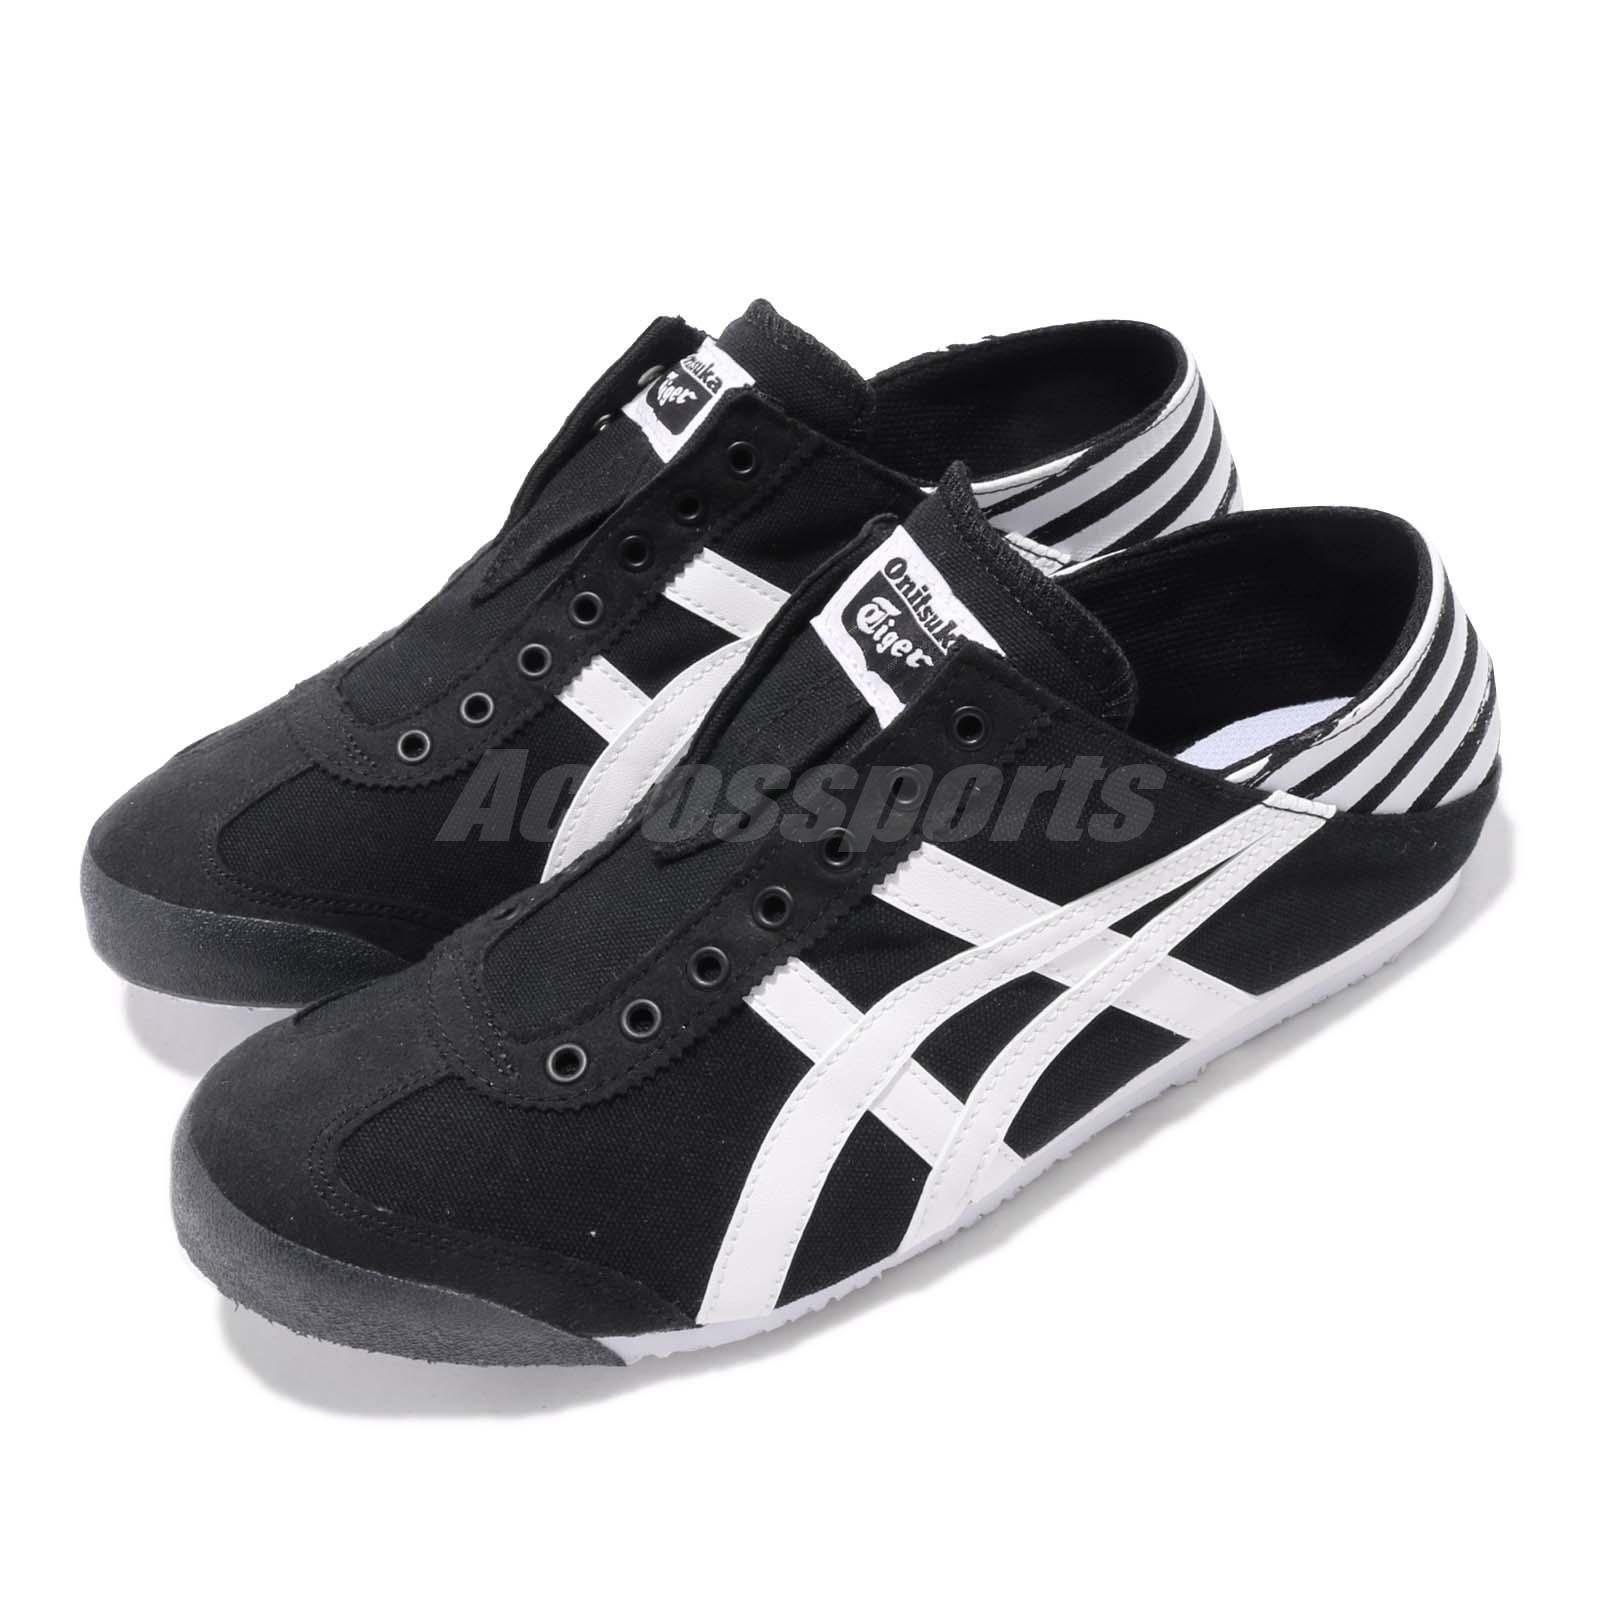 mens mizuno running shoes size 9.5 europe hoy mexico